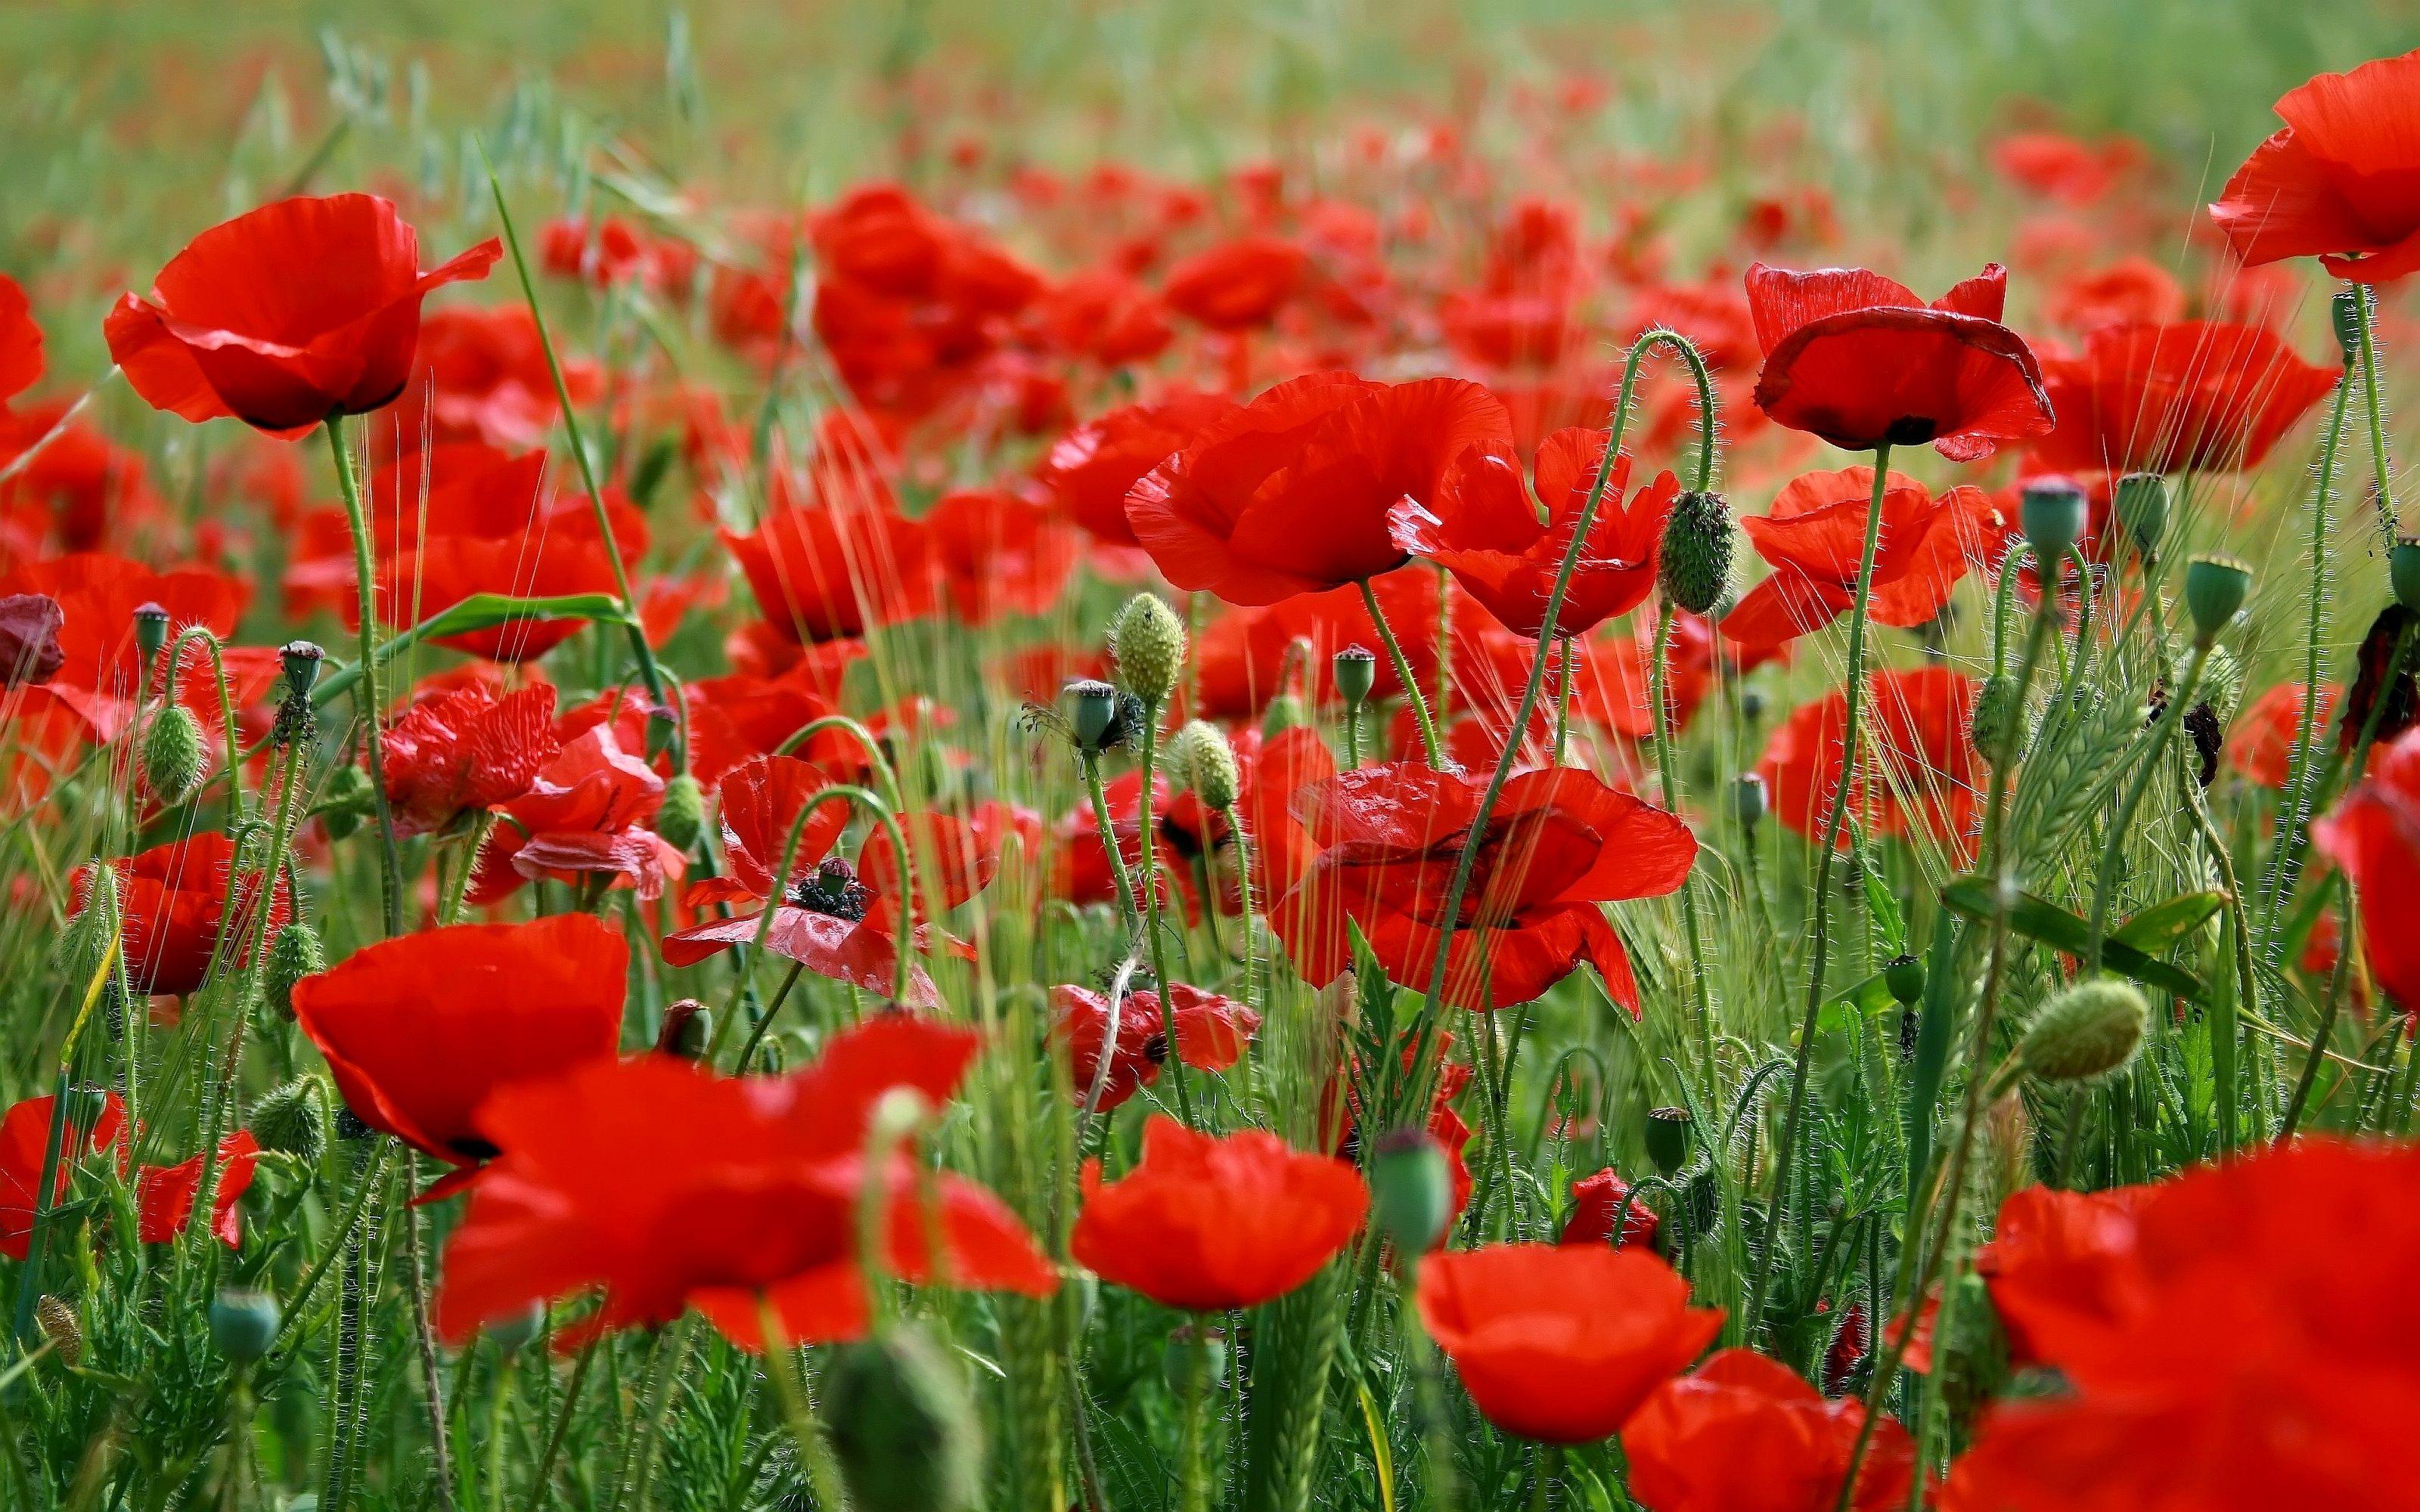 nature flowers fields poppy field wild poppies HD Wallpaper You are 3200x2000